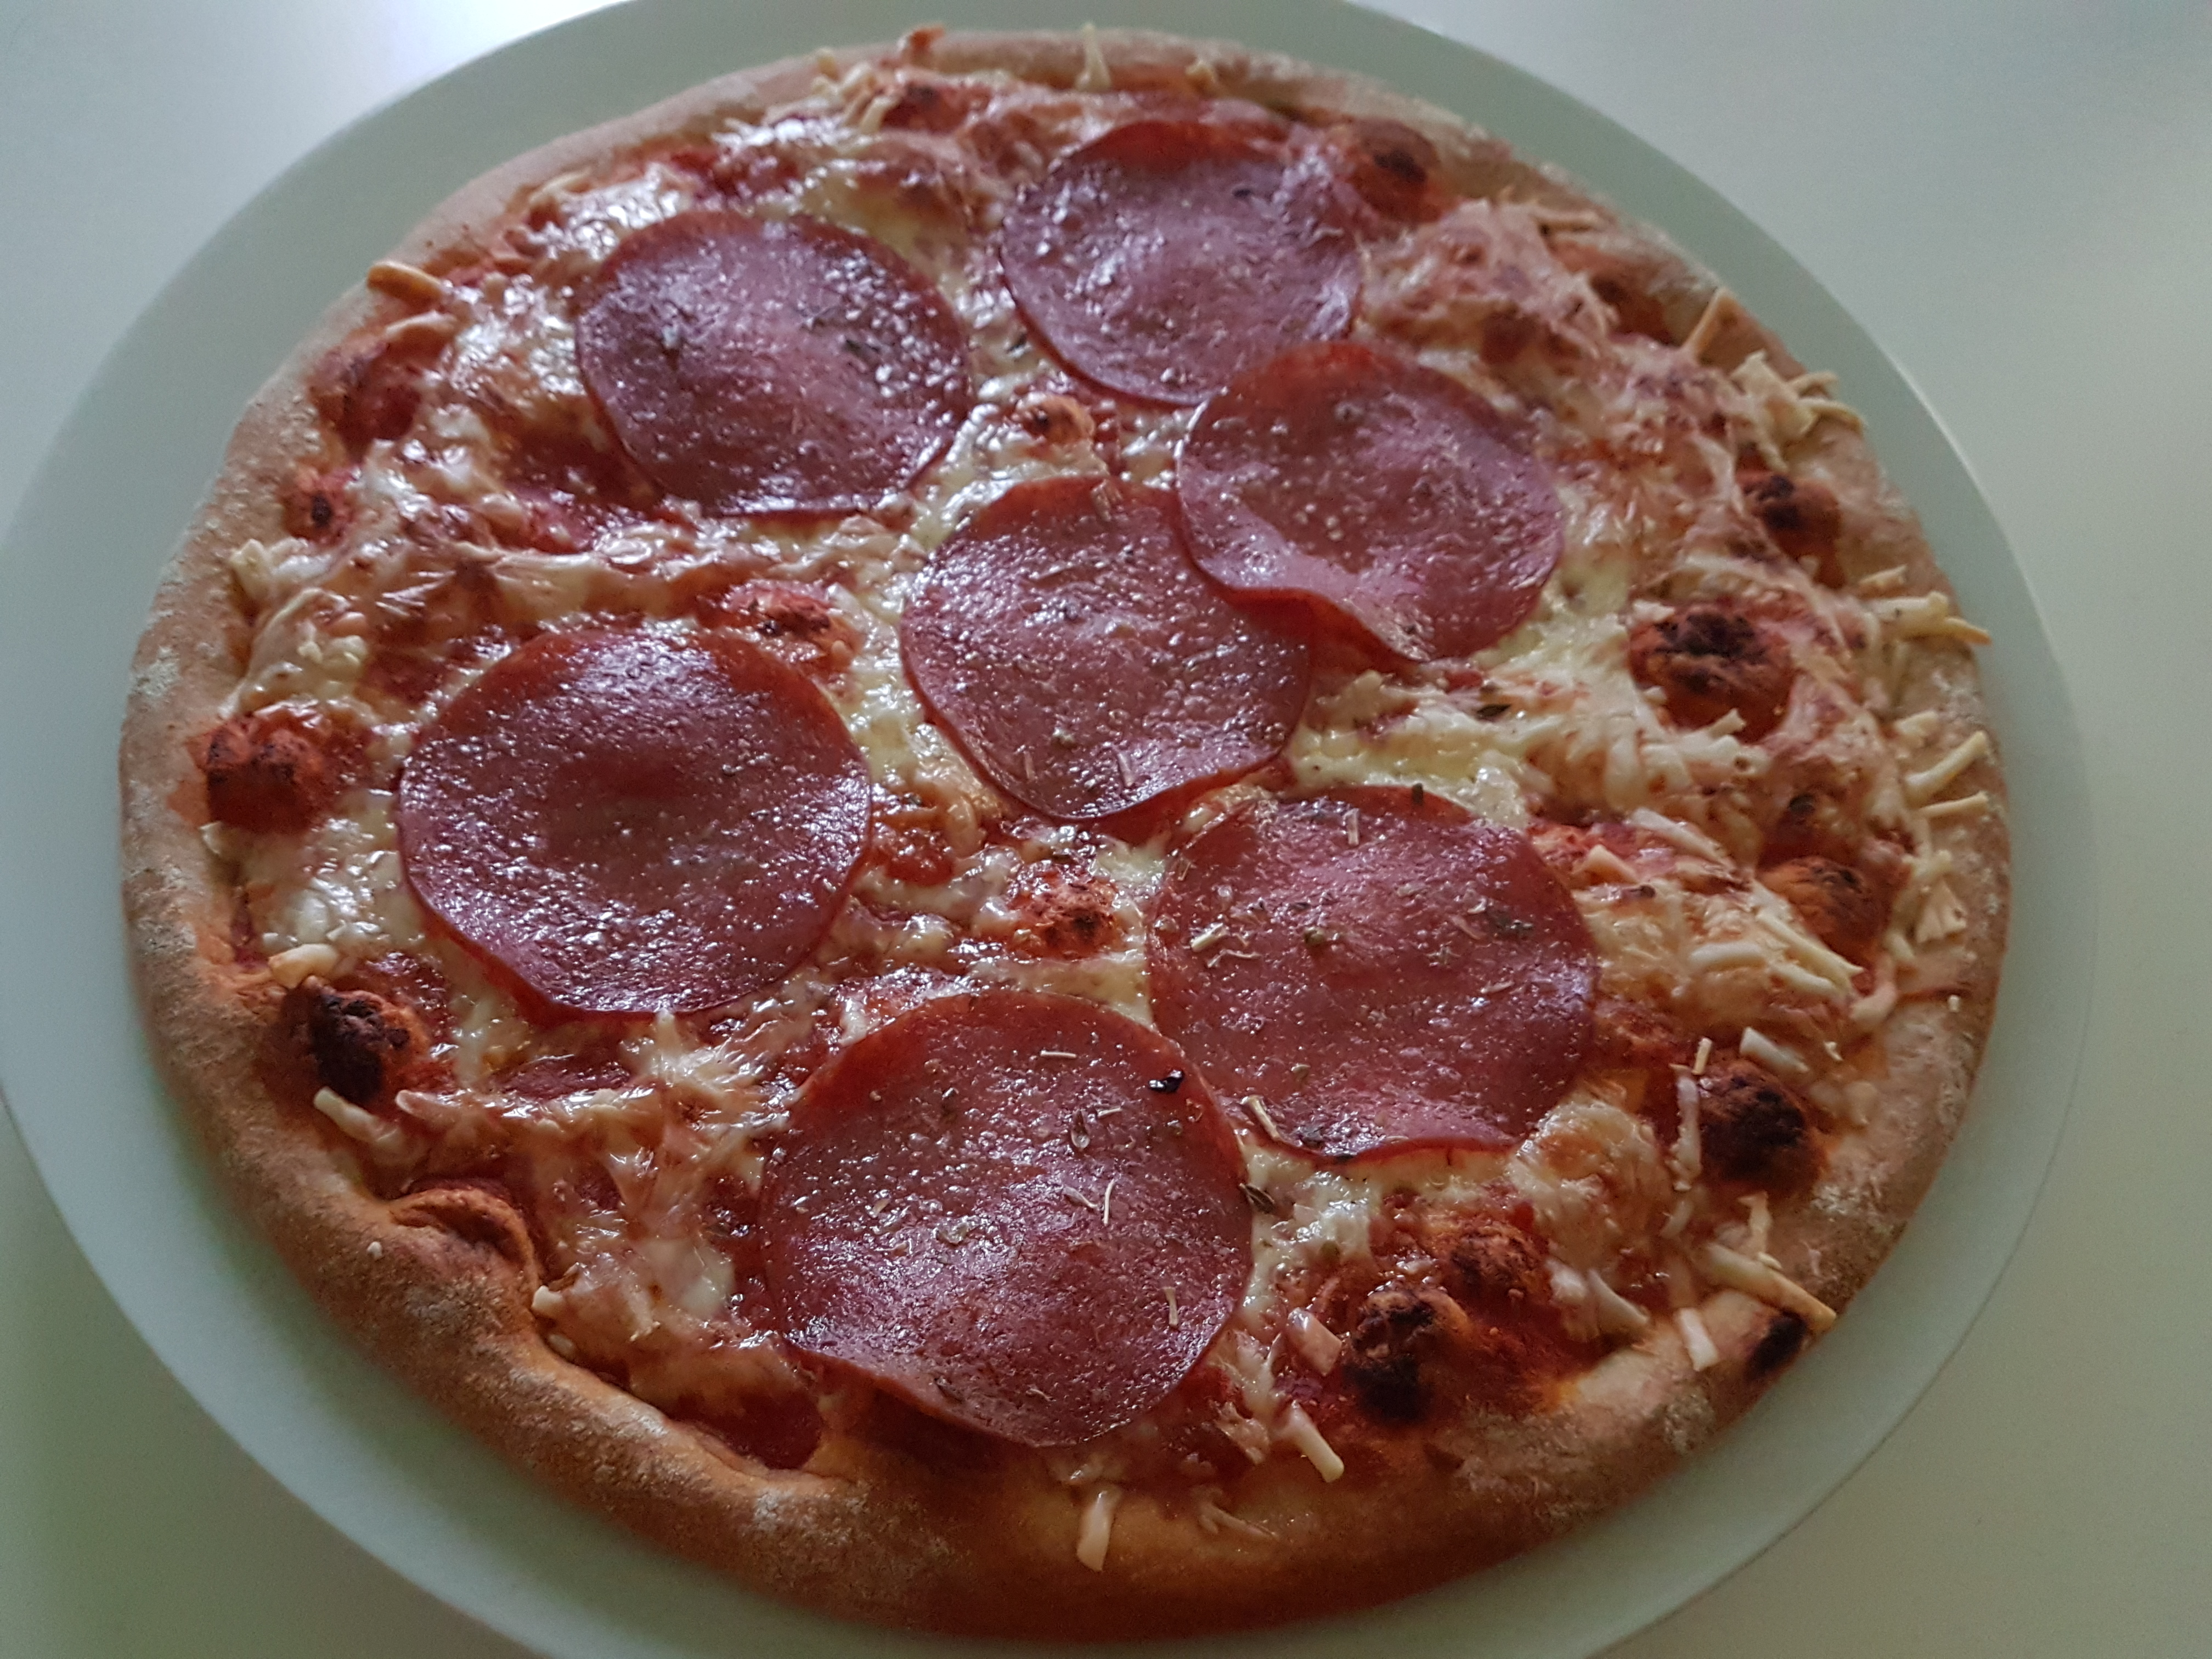 http://foodloader.net/Holz_2018-01-01_Pizza_2.jpg